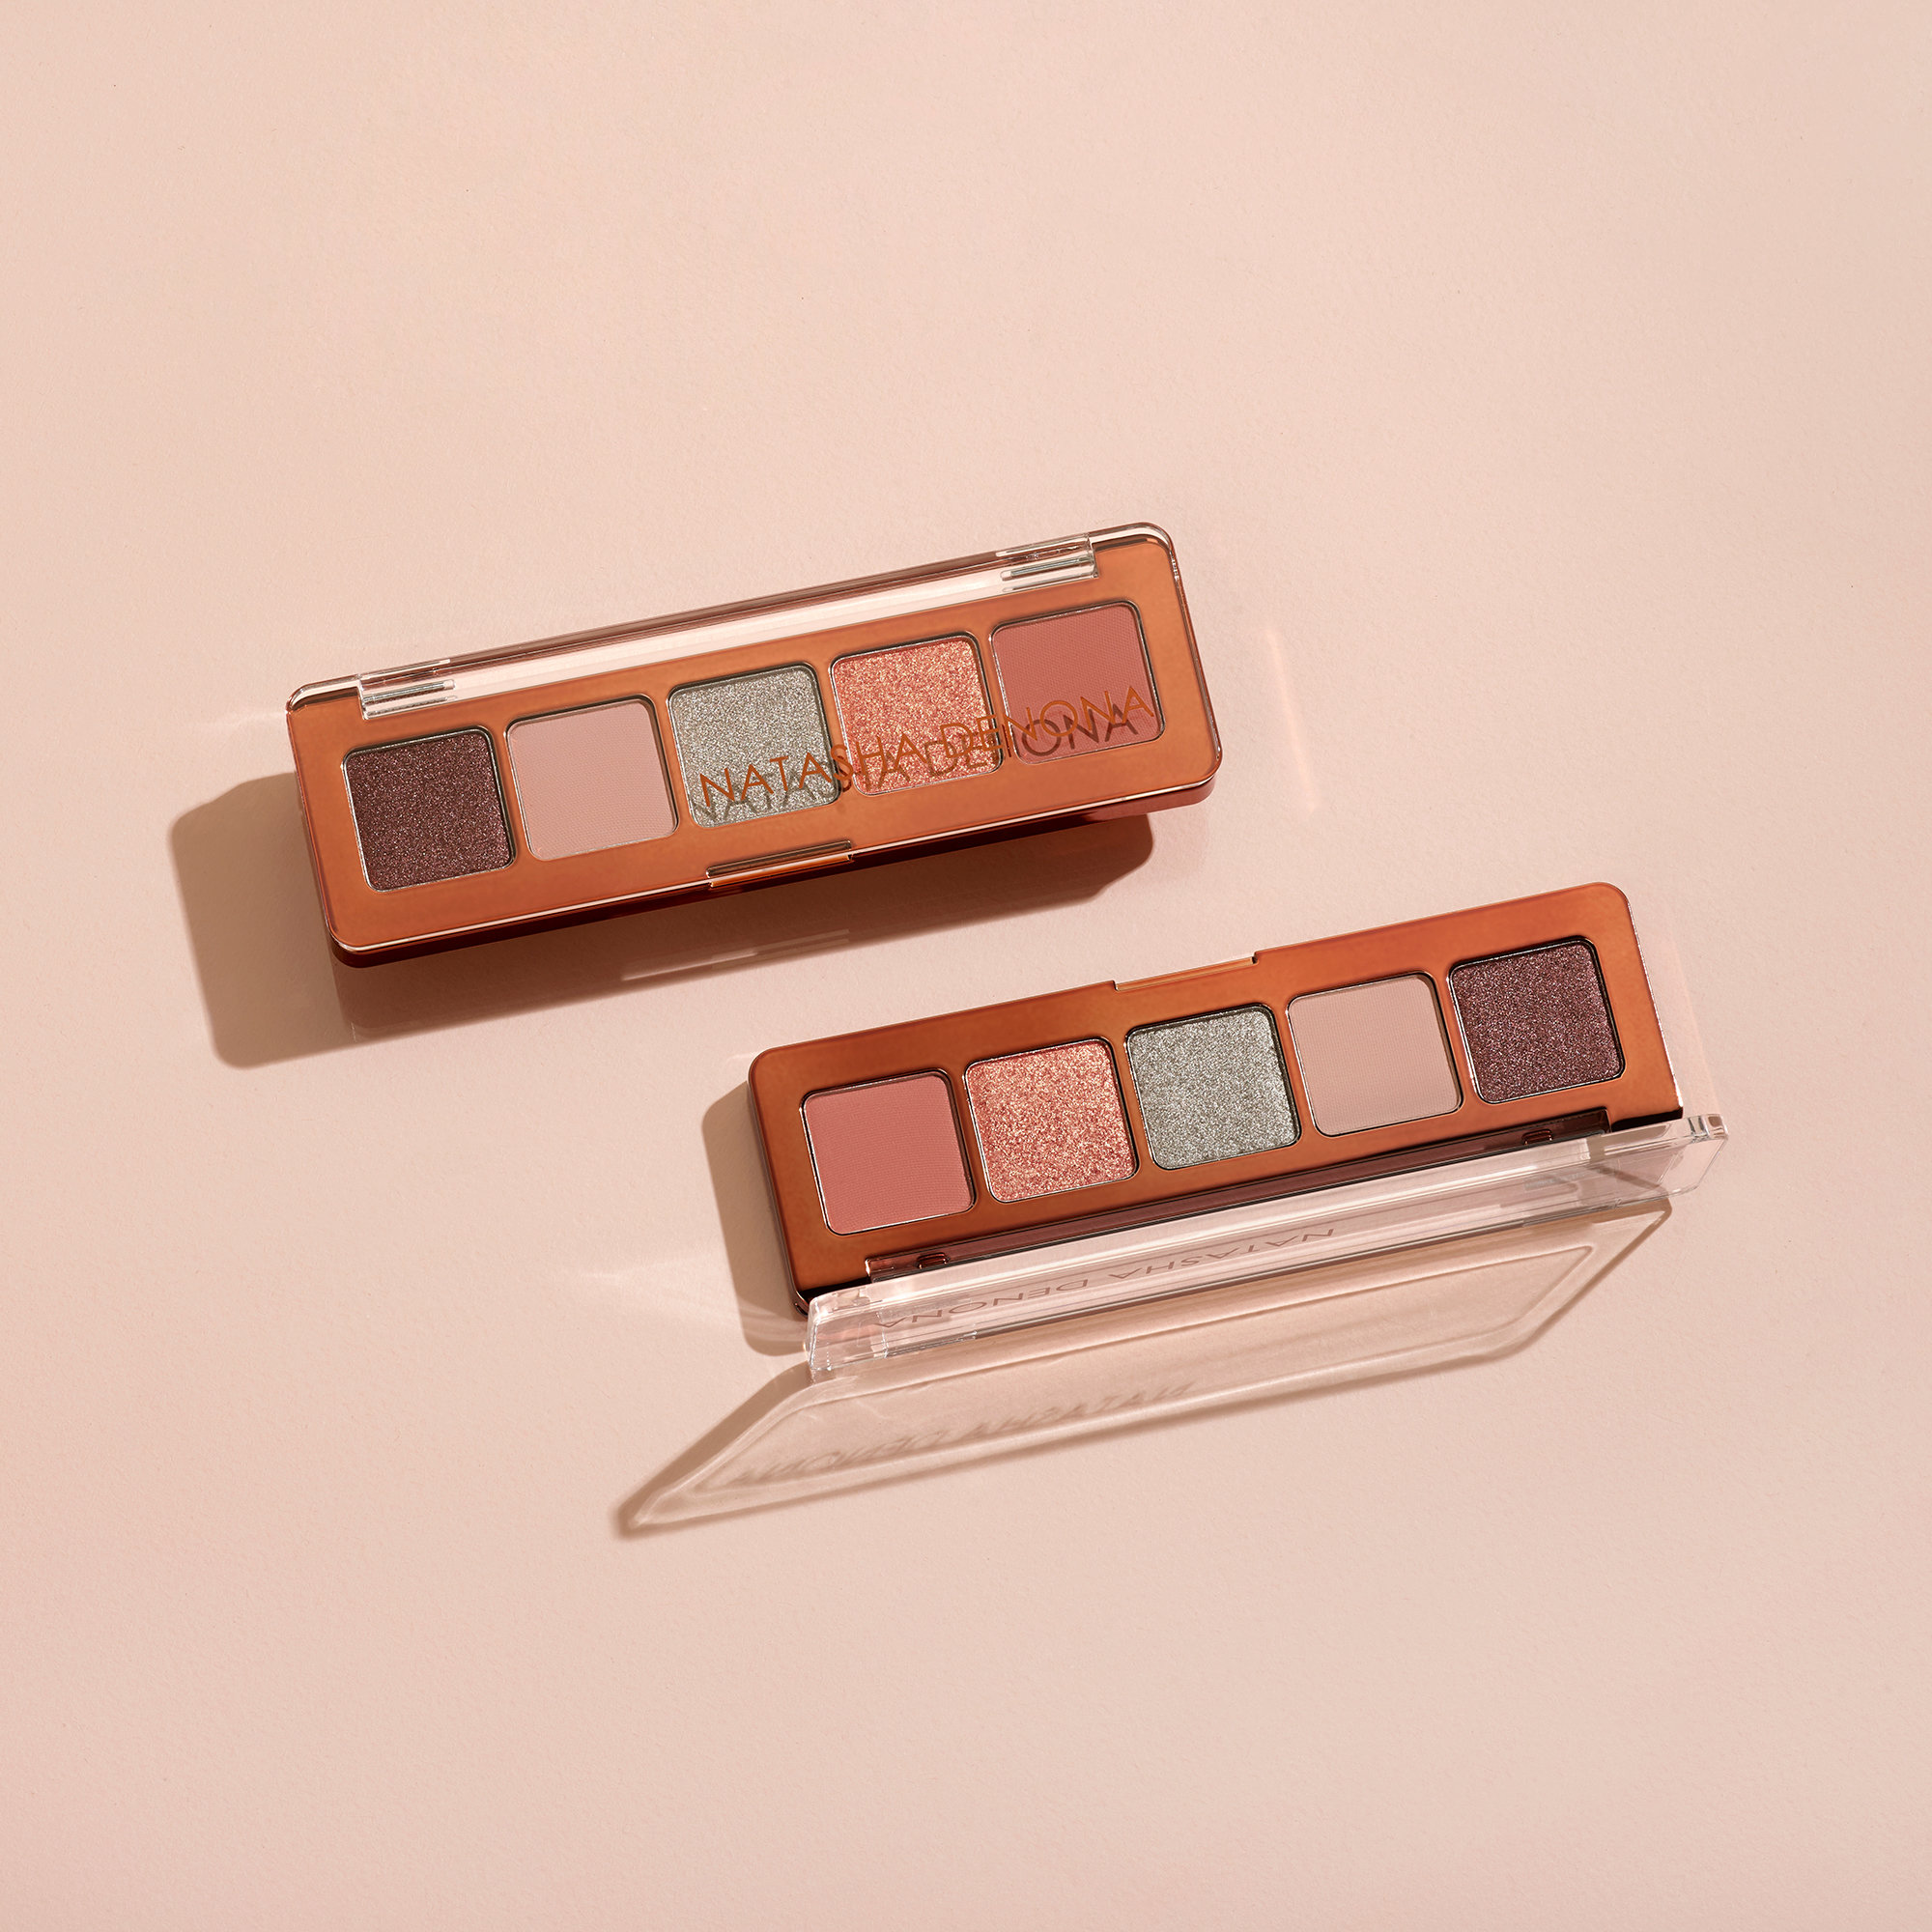 Alternate product image for Mini Zendo Palette shown with the description.